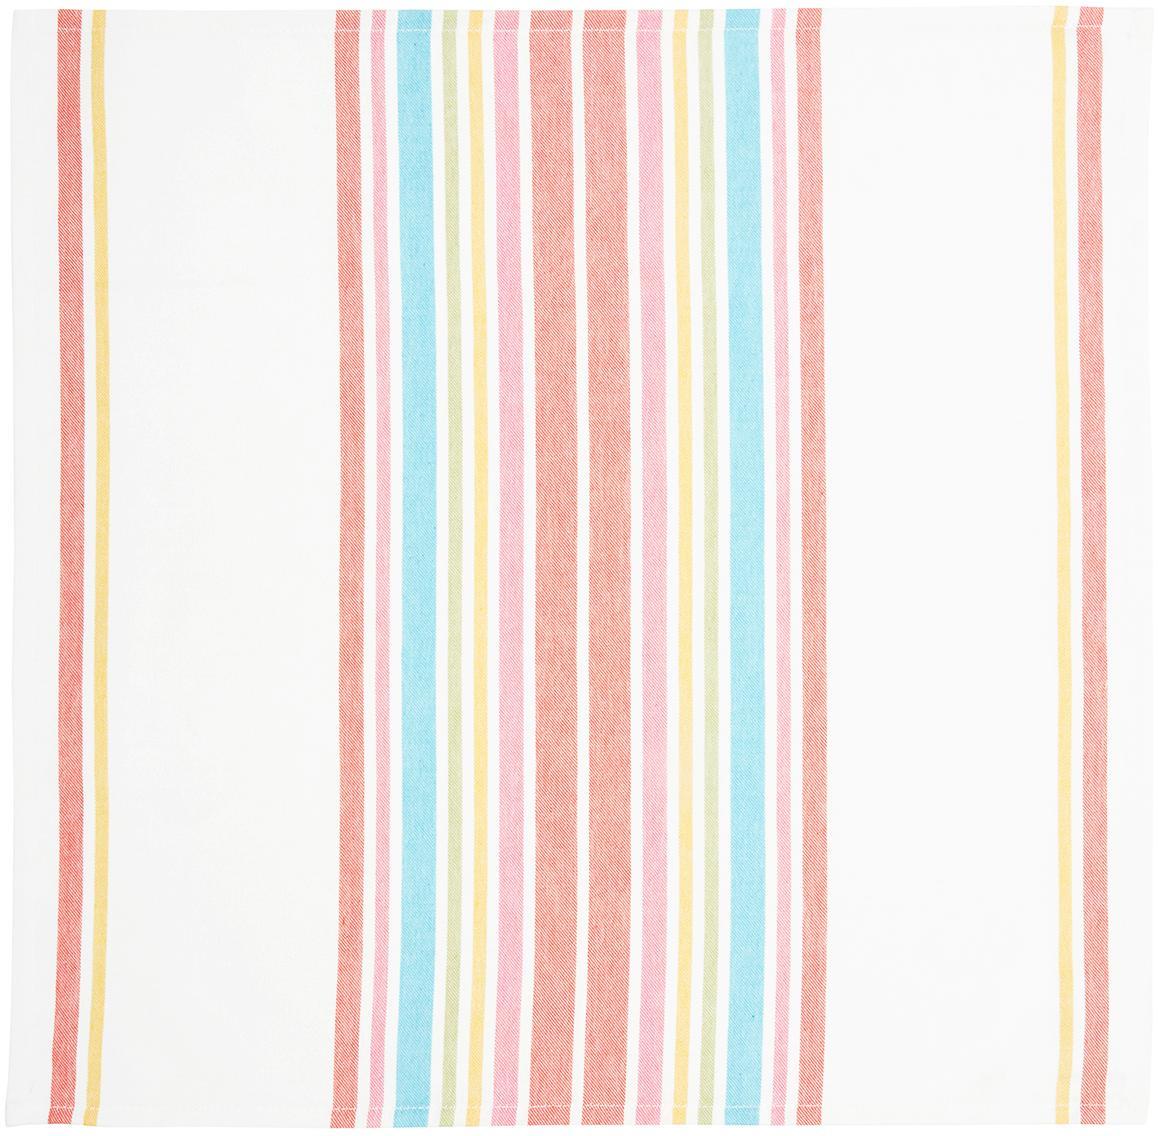 Katoenen servetten Katie, 2 stuks, Katoen, Multicolour, 50 x 50 cm